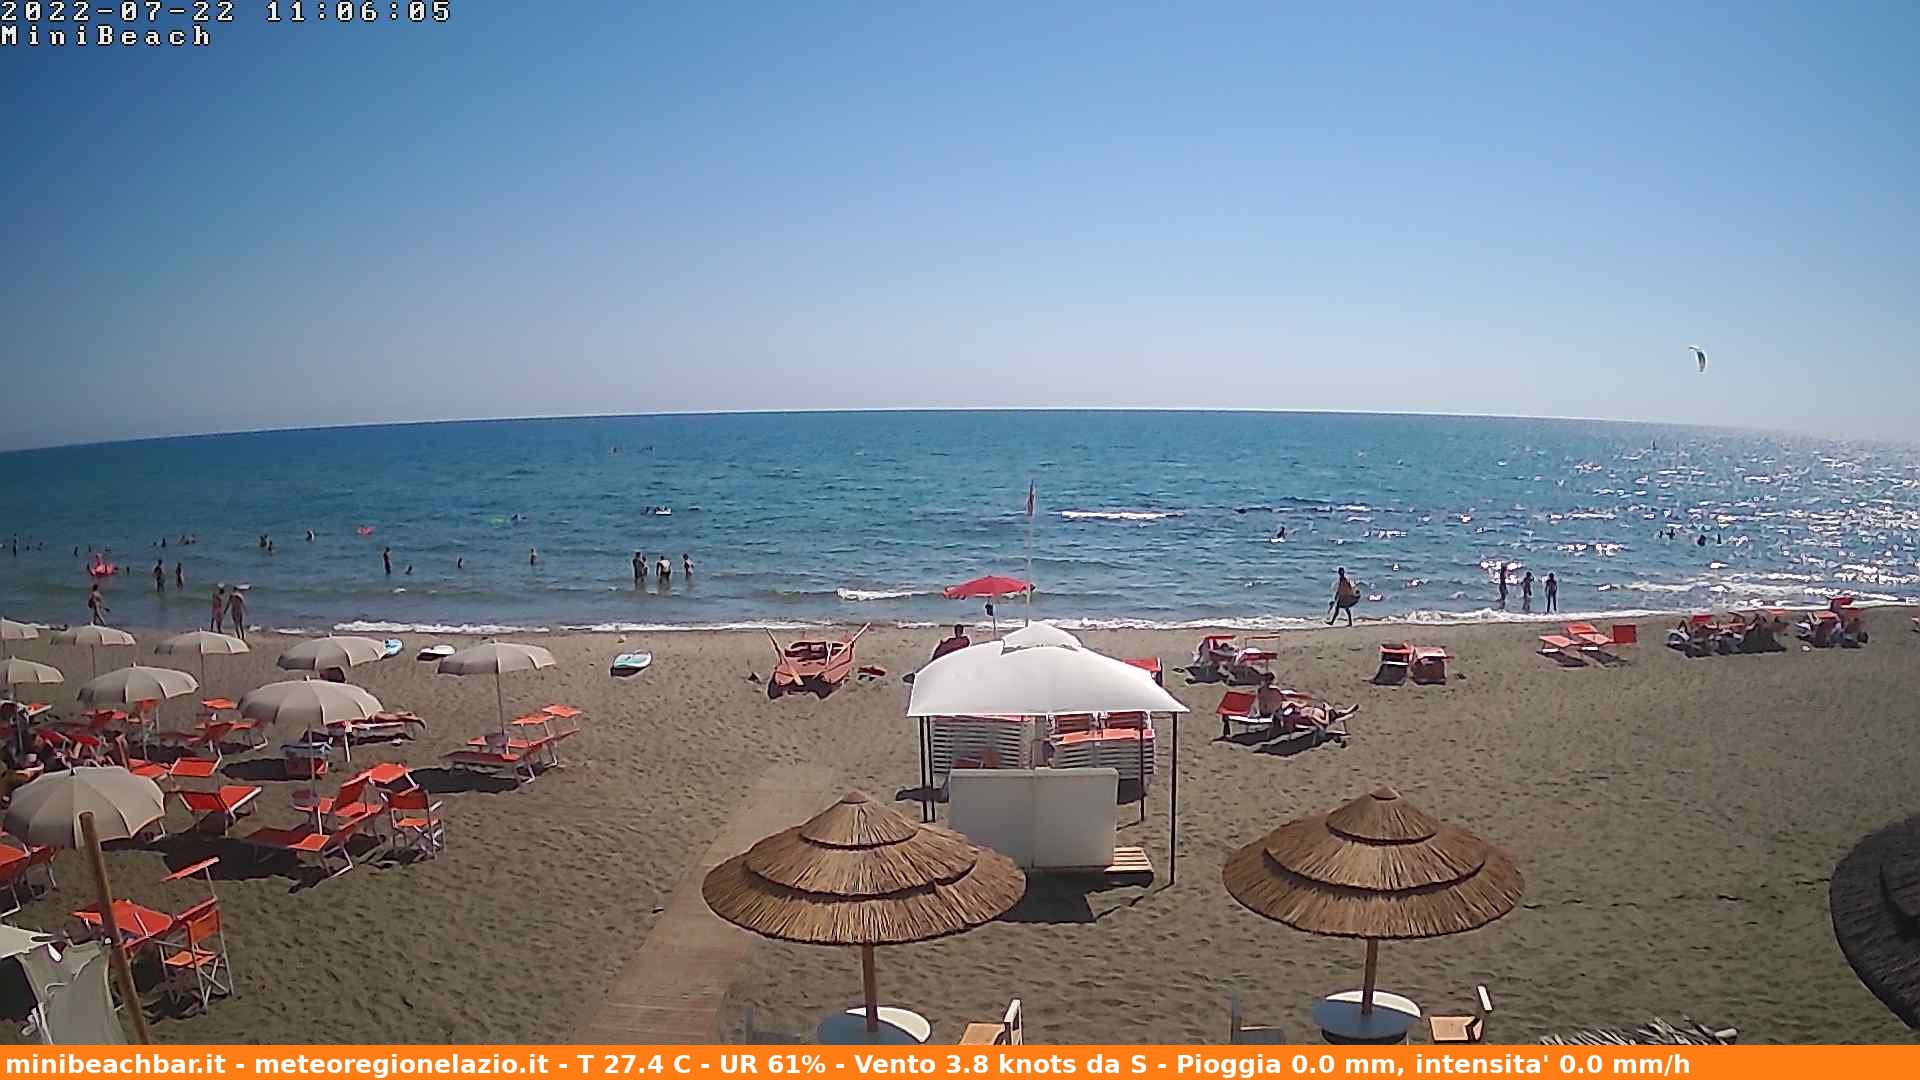 Webcam Ladispoli, Marina di San Nicola - Meteo Lazio